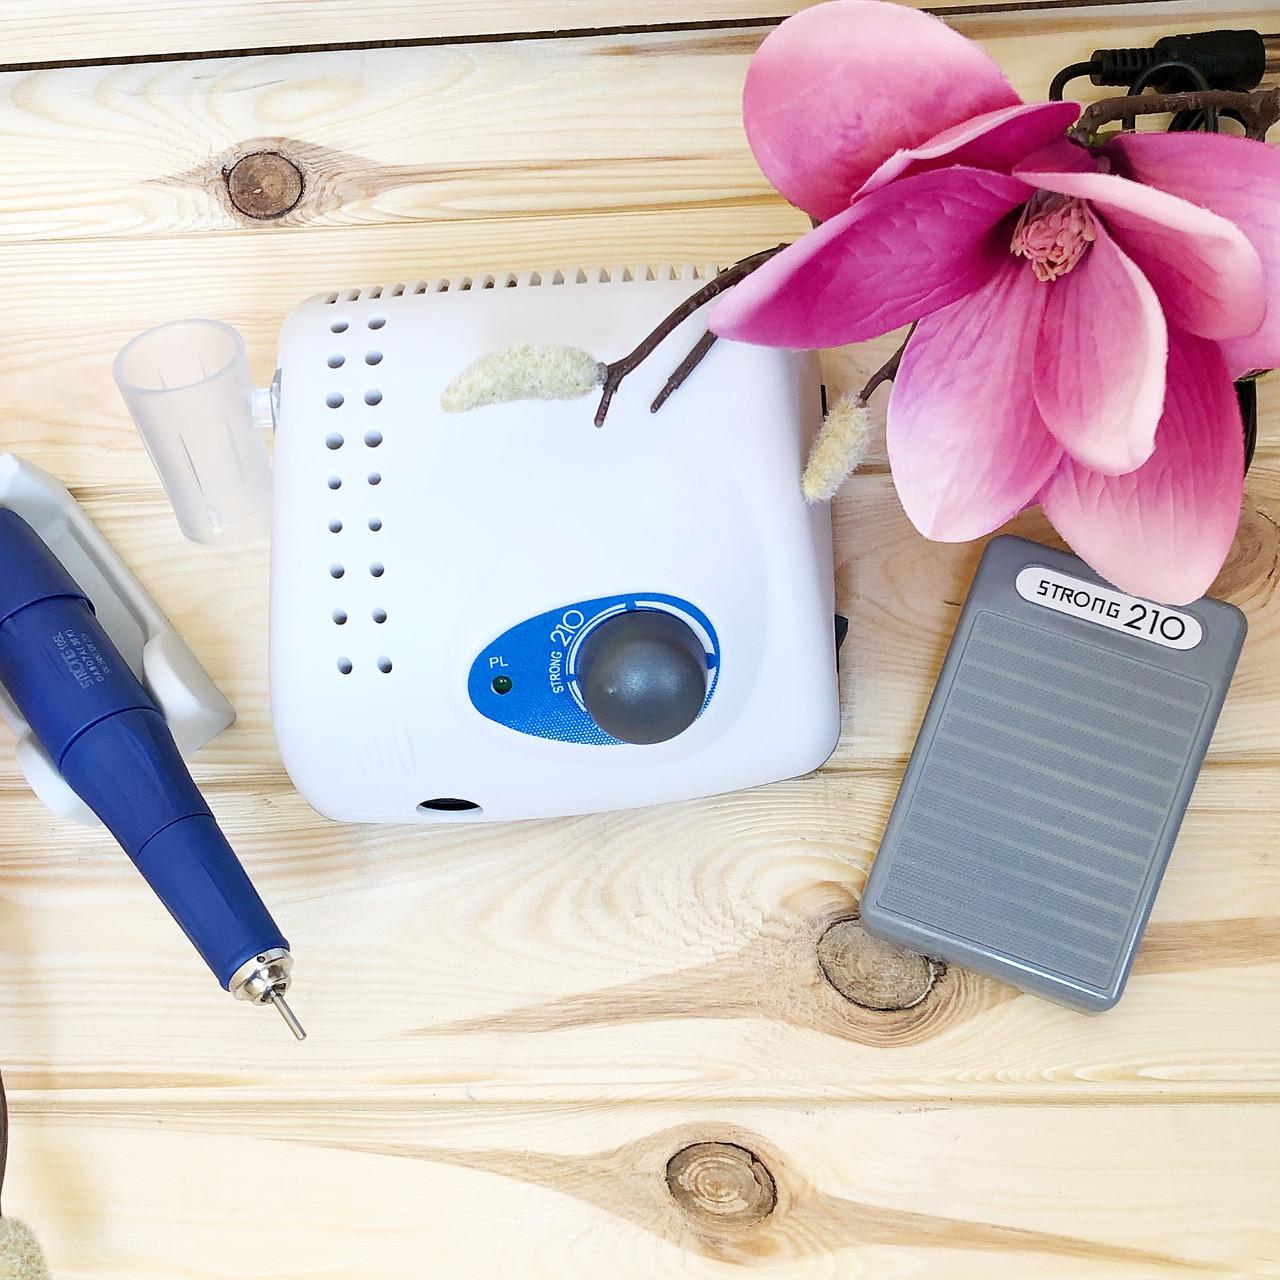 Аппарат для маникюра и педикюра (фрезер) Strong 210 +ручка 105L